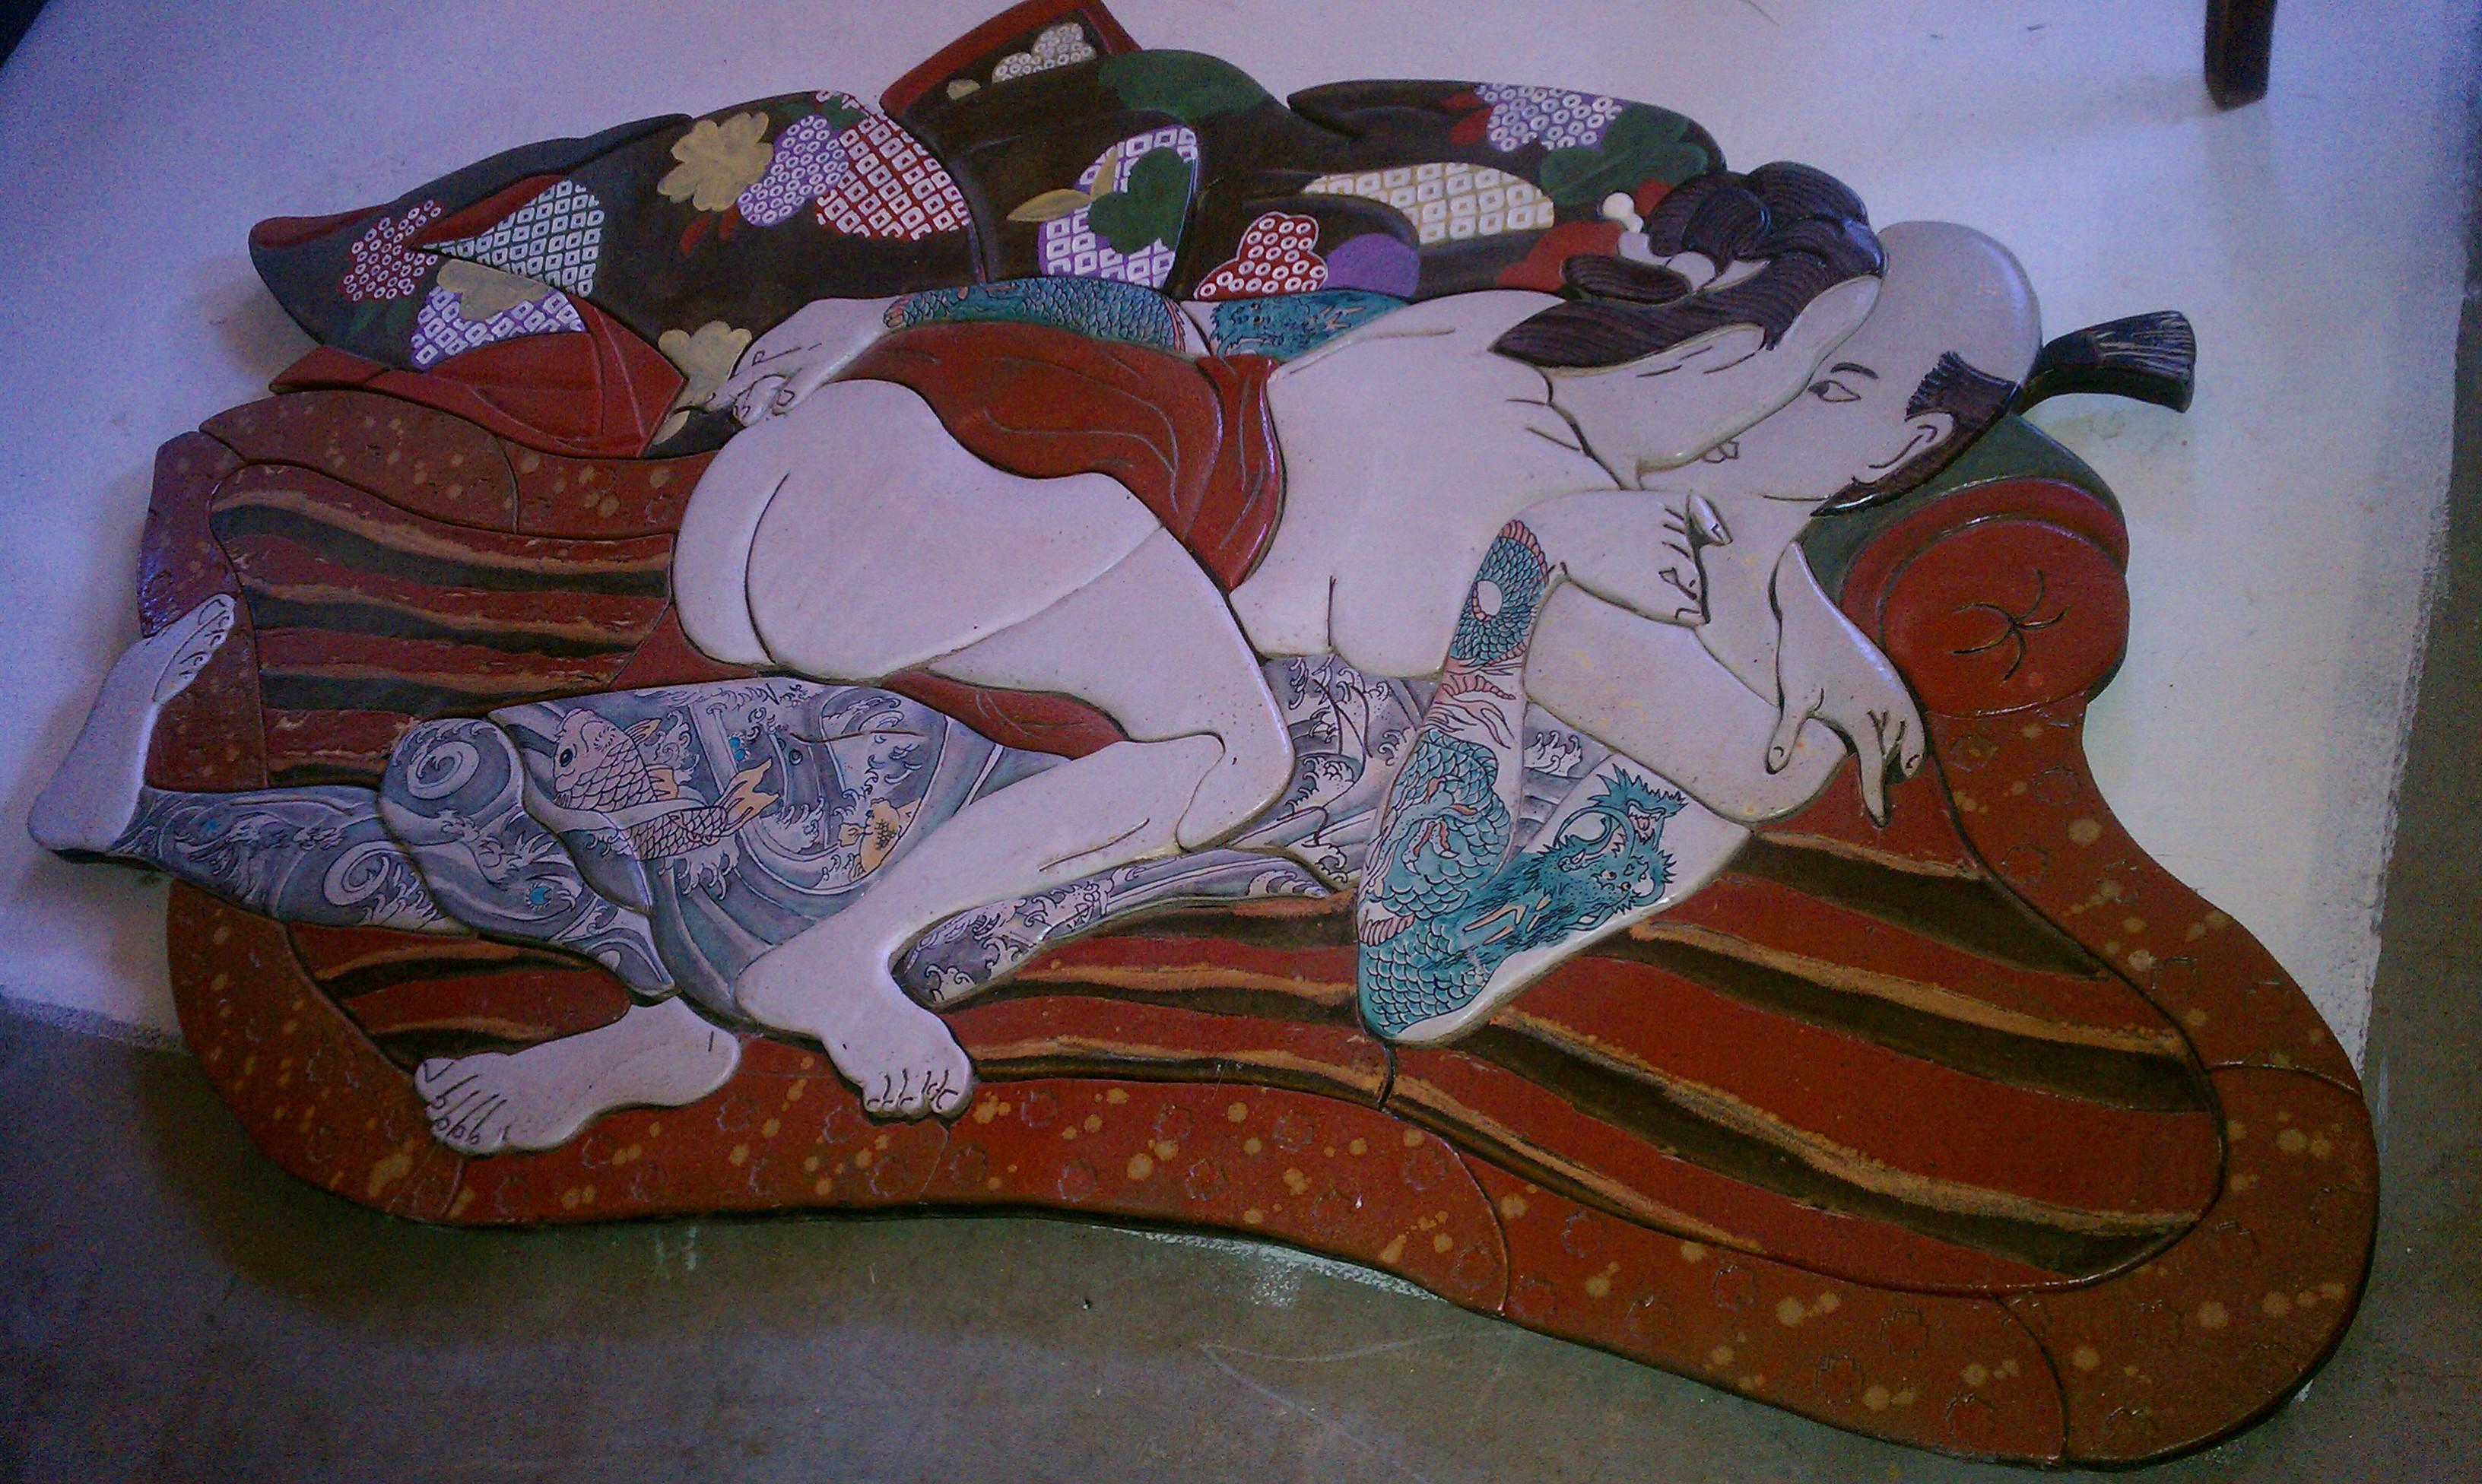 Conosciuto Vintage Japanese Shunga Erotic Art ??? Value and any info wold be  TD23